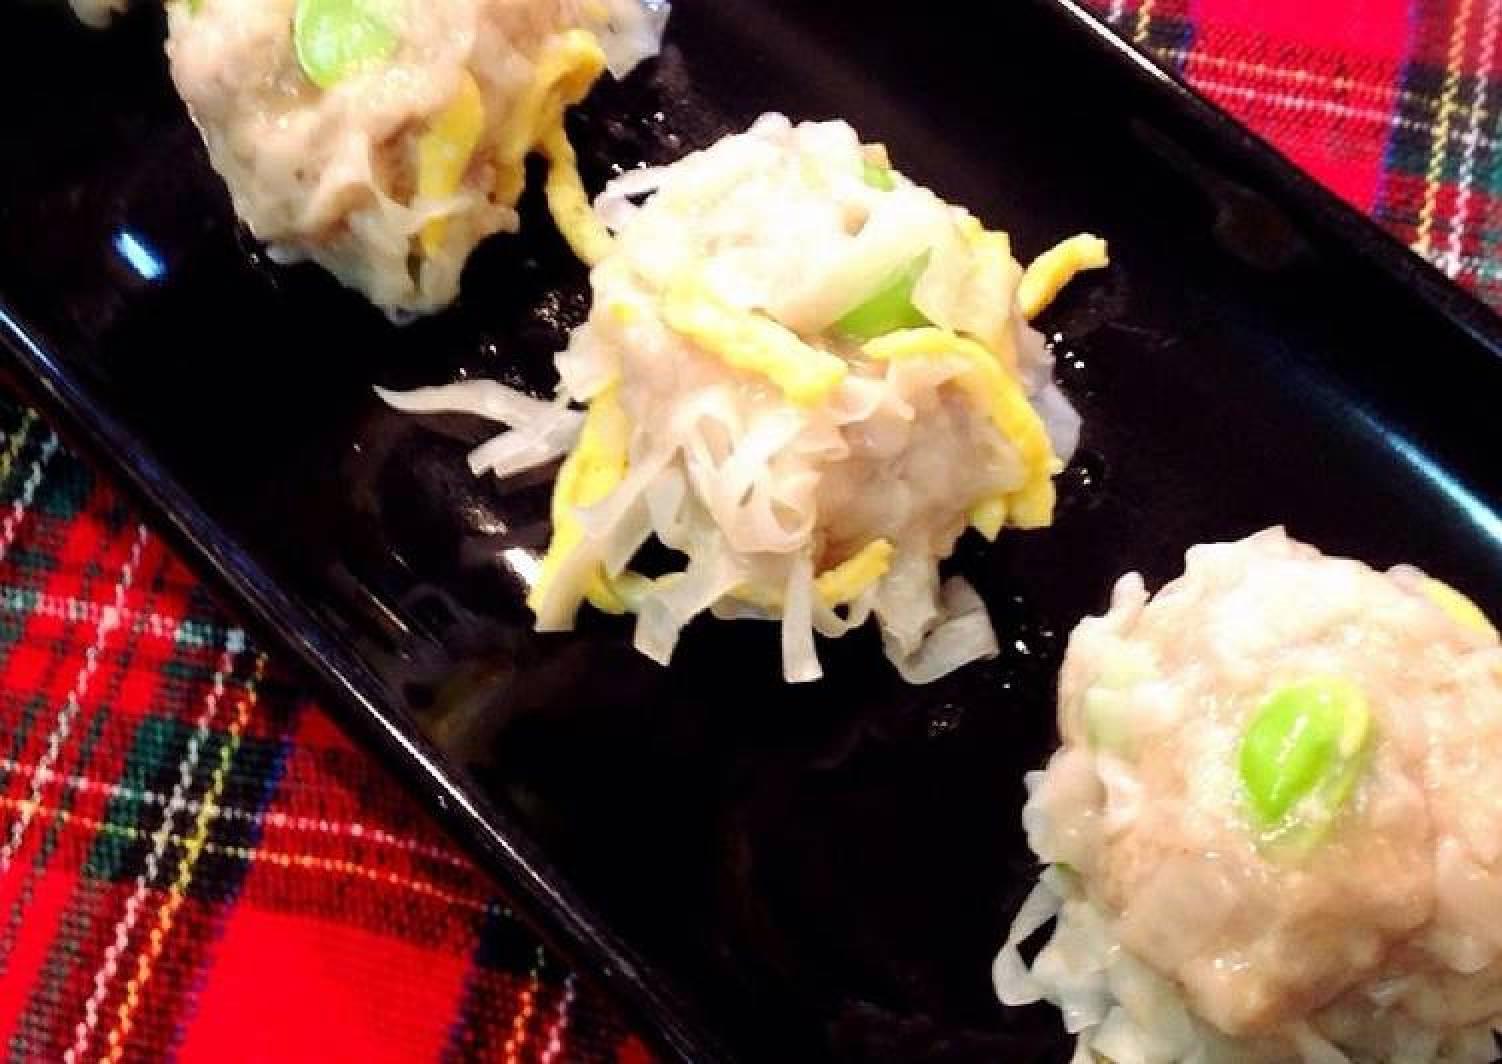 Bursting with Edamame! Shumai Dumplings with Wings